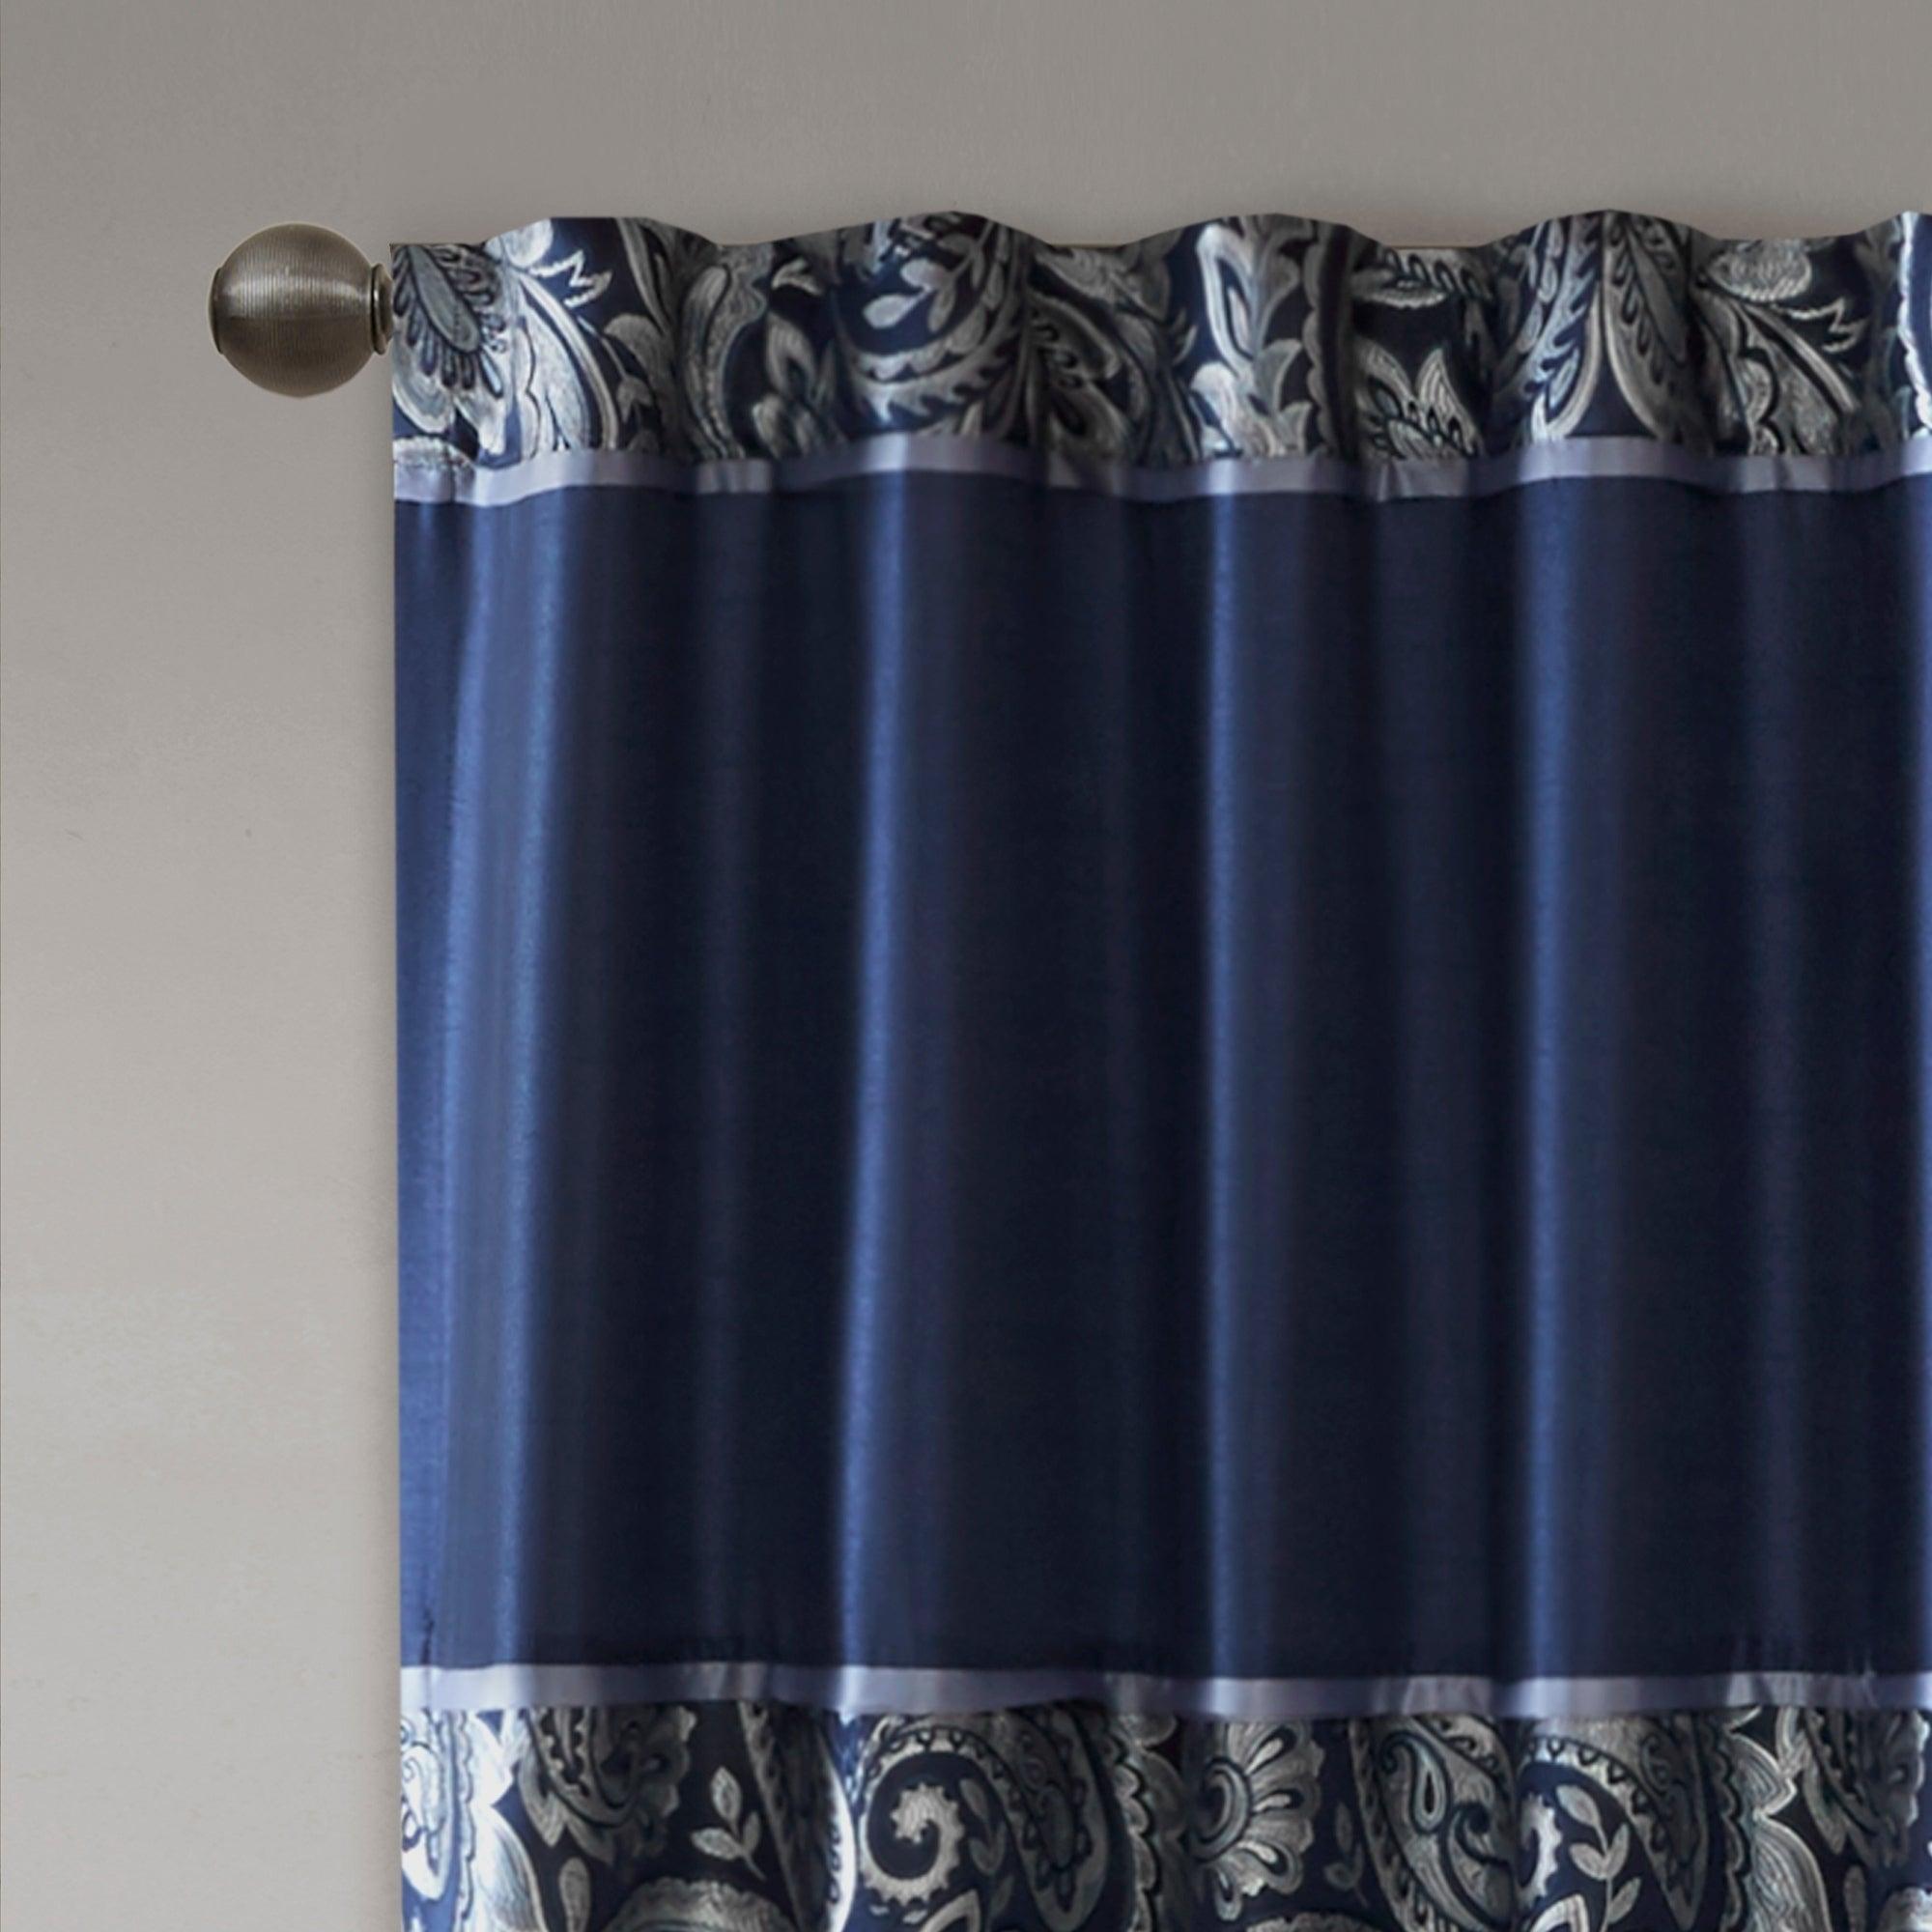 Madison Park Whitman Curtain Panel Pair Regarding Whitman Curtain Panel Pairs (View 5 of 30)